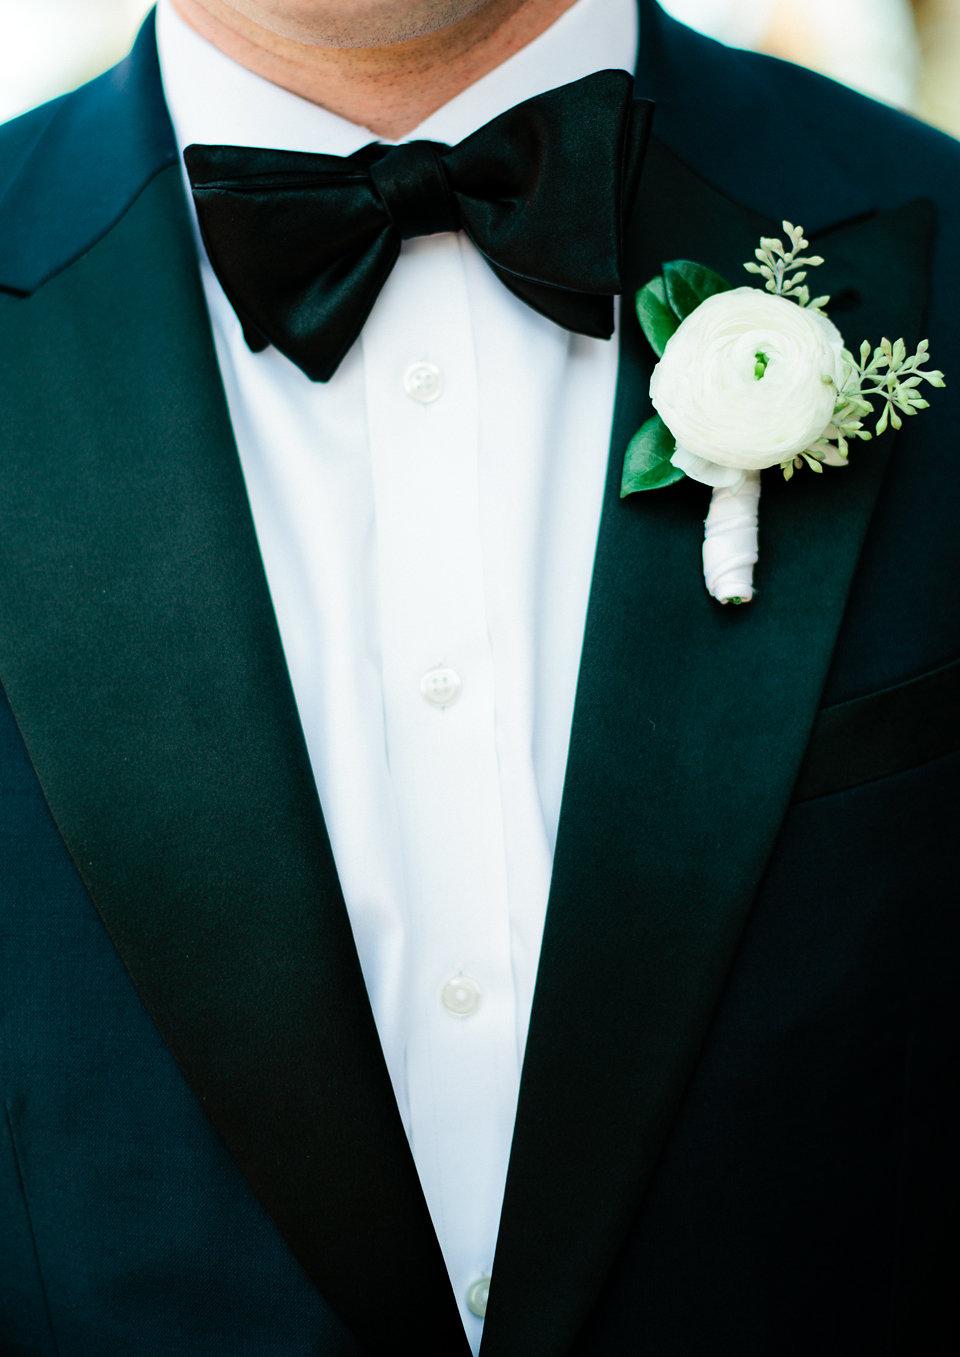 Ivory Ranunculus Boutonniere with Black Tux  Blush Wedding at TPC Sawgrass Wedding Ponte Vedra Beach  Jacksonville Wedding Planner Blue Ribbon Weddings  Jacksonville Wedding Photographer Debra Eby Photography  Wedding Ceremony & Reception at TPC Sawgrass Jacksonville